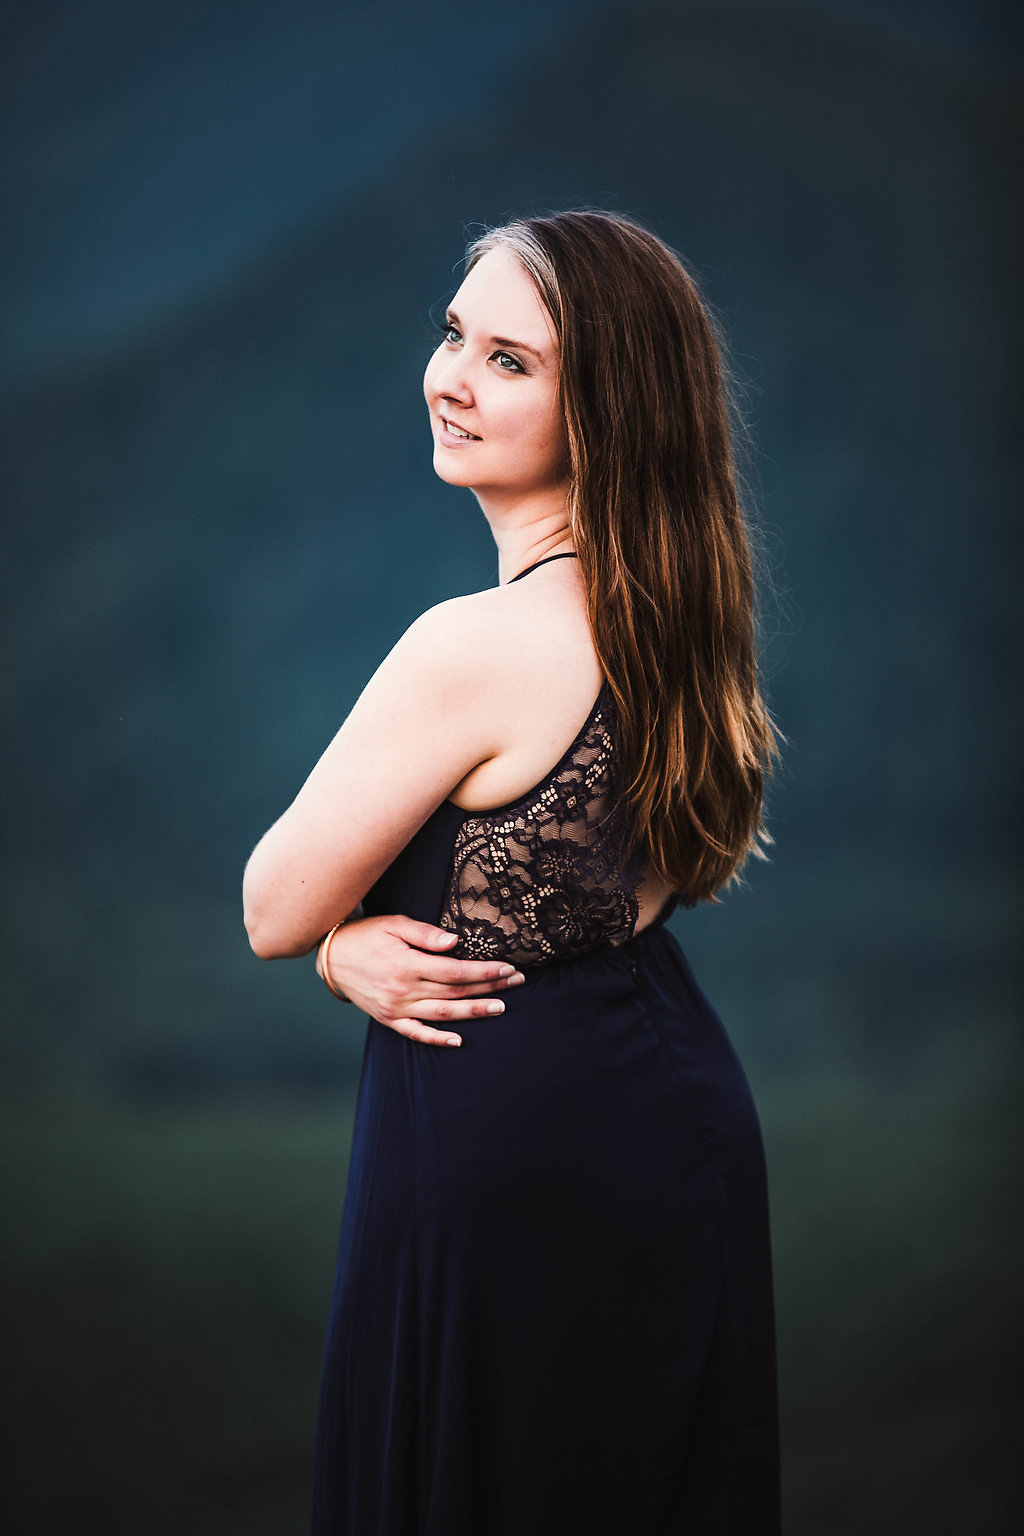 Eivind+Elyse_Engagement_Rattlesnake_lake_ridge_Seattle_Photographer_Adina_Preston_Weddings_176.JPG